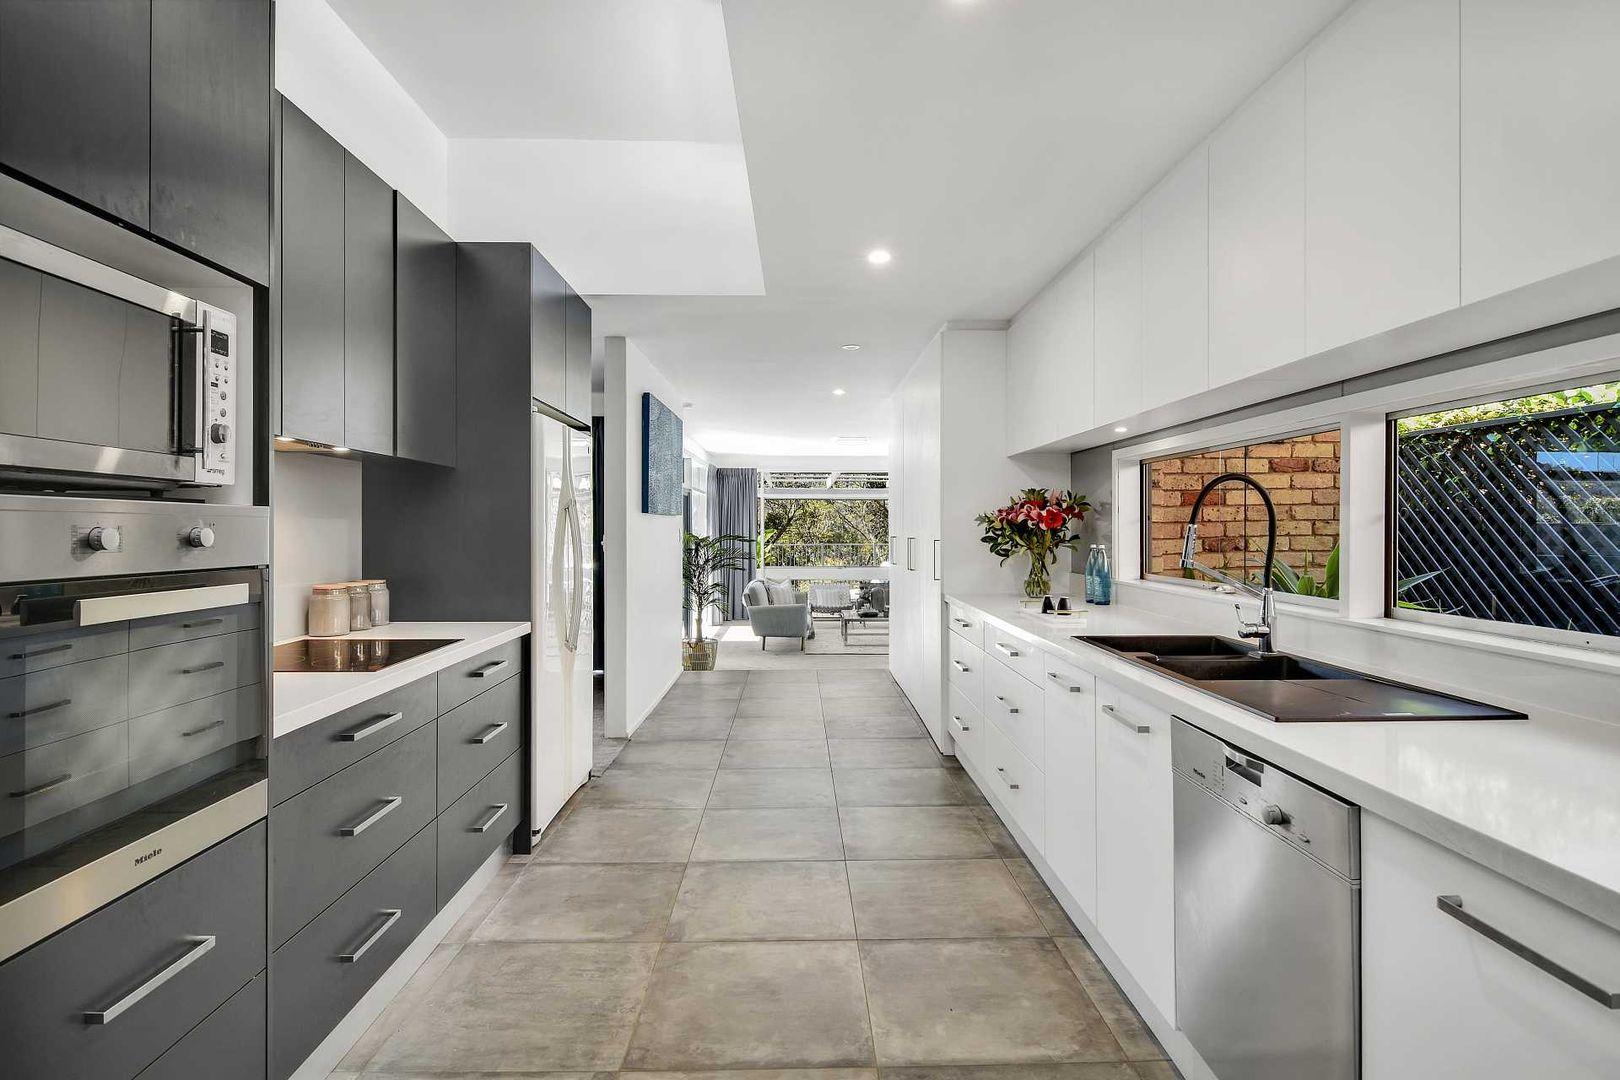 12 Athlone Crescent, Killarney Heights NSW 2087, Image 0